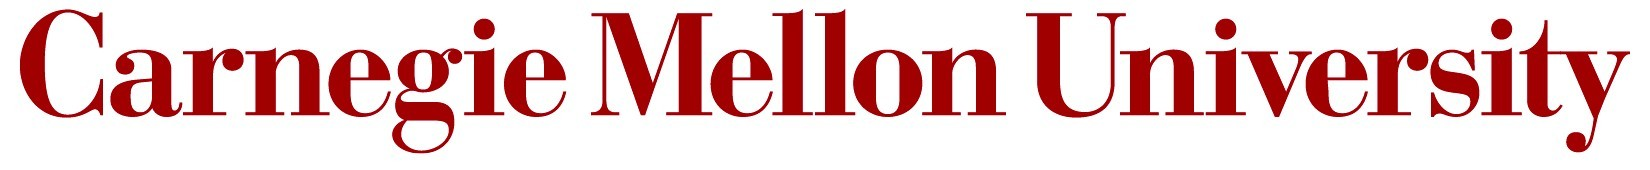 CMU_Logo_Carnegie_Mellon_University1